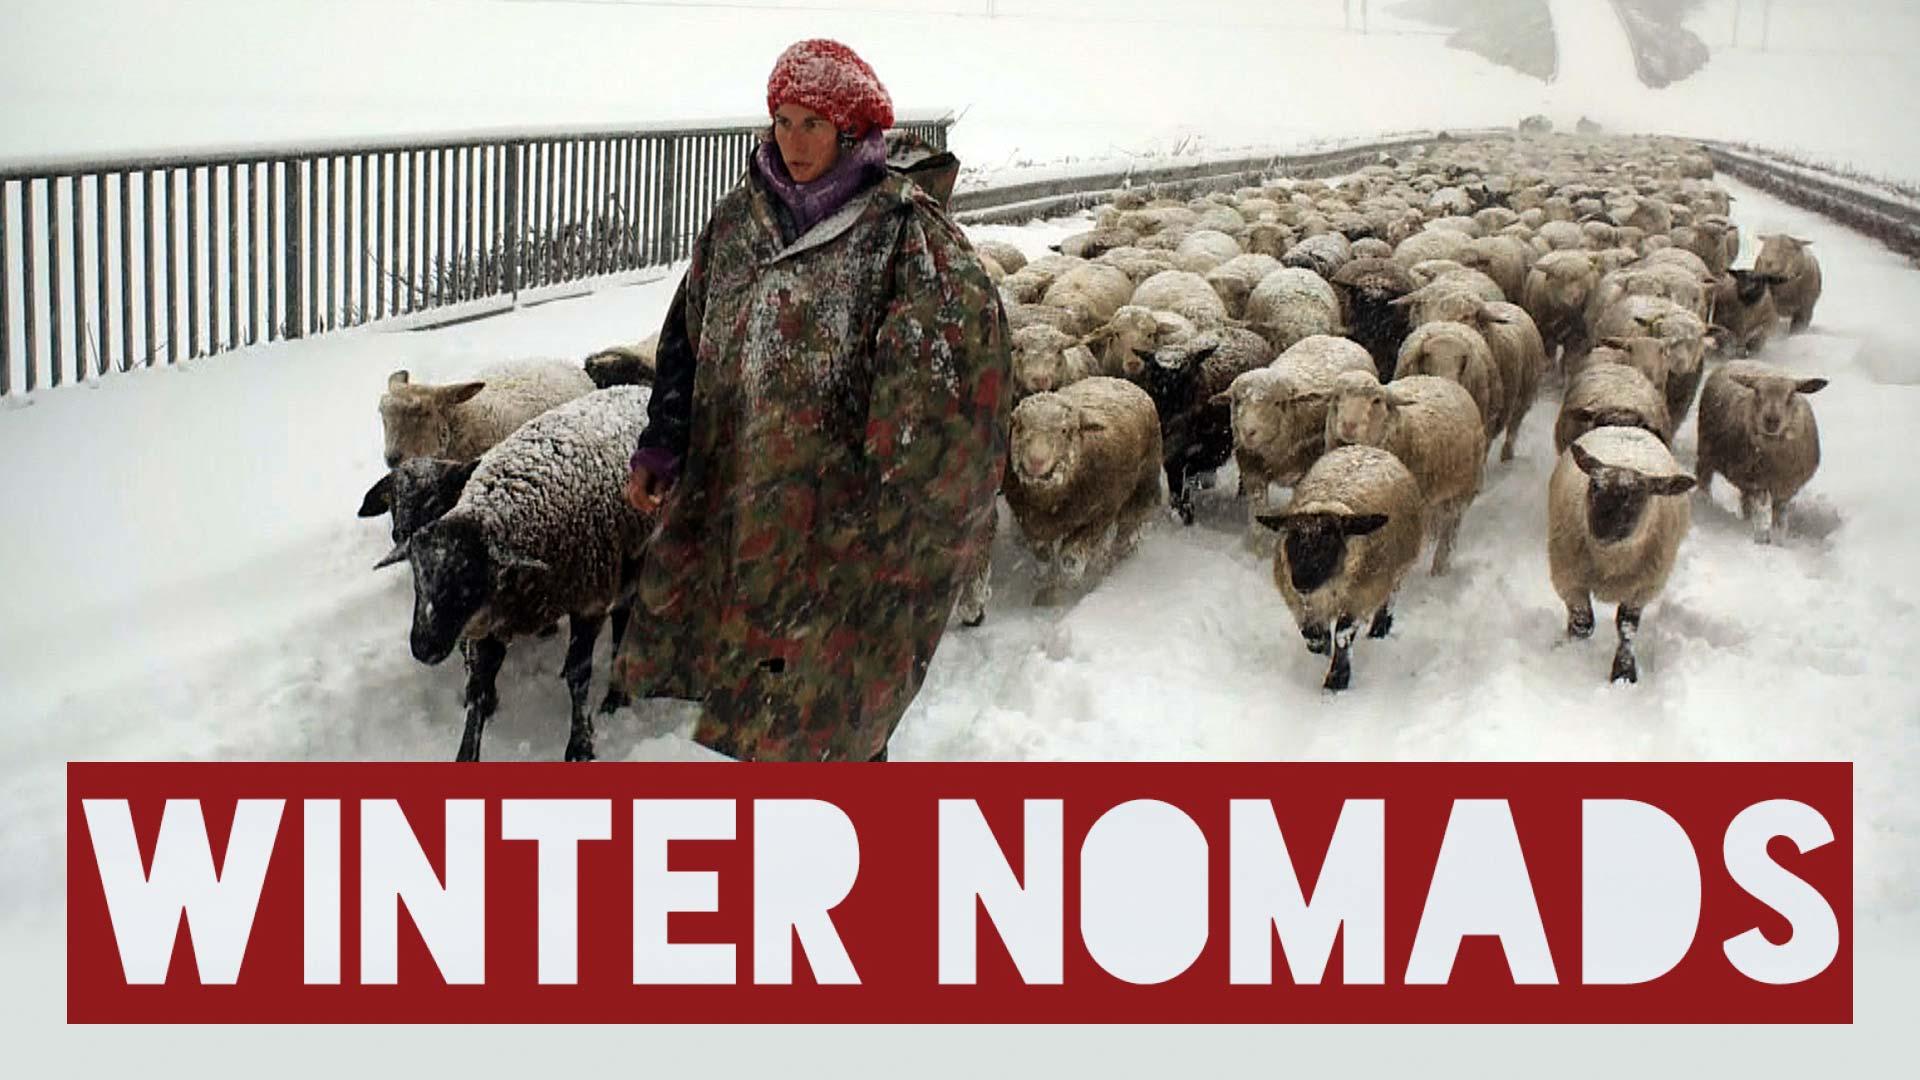 Winter Nomads - image